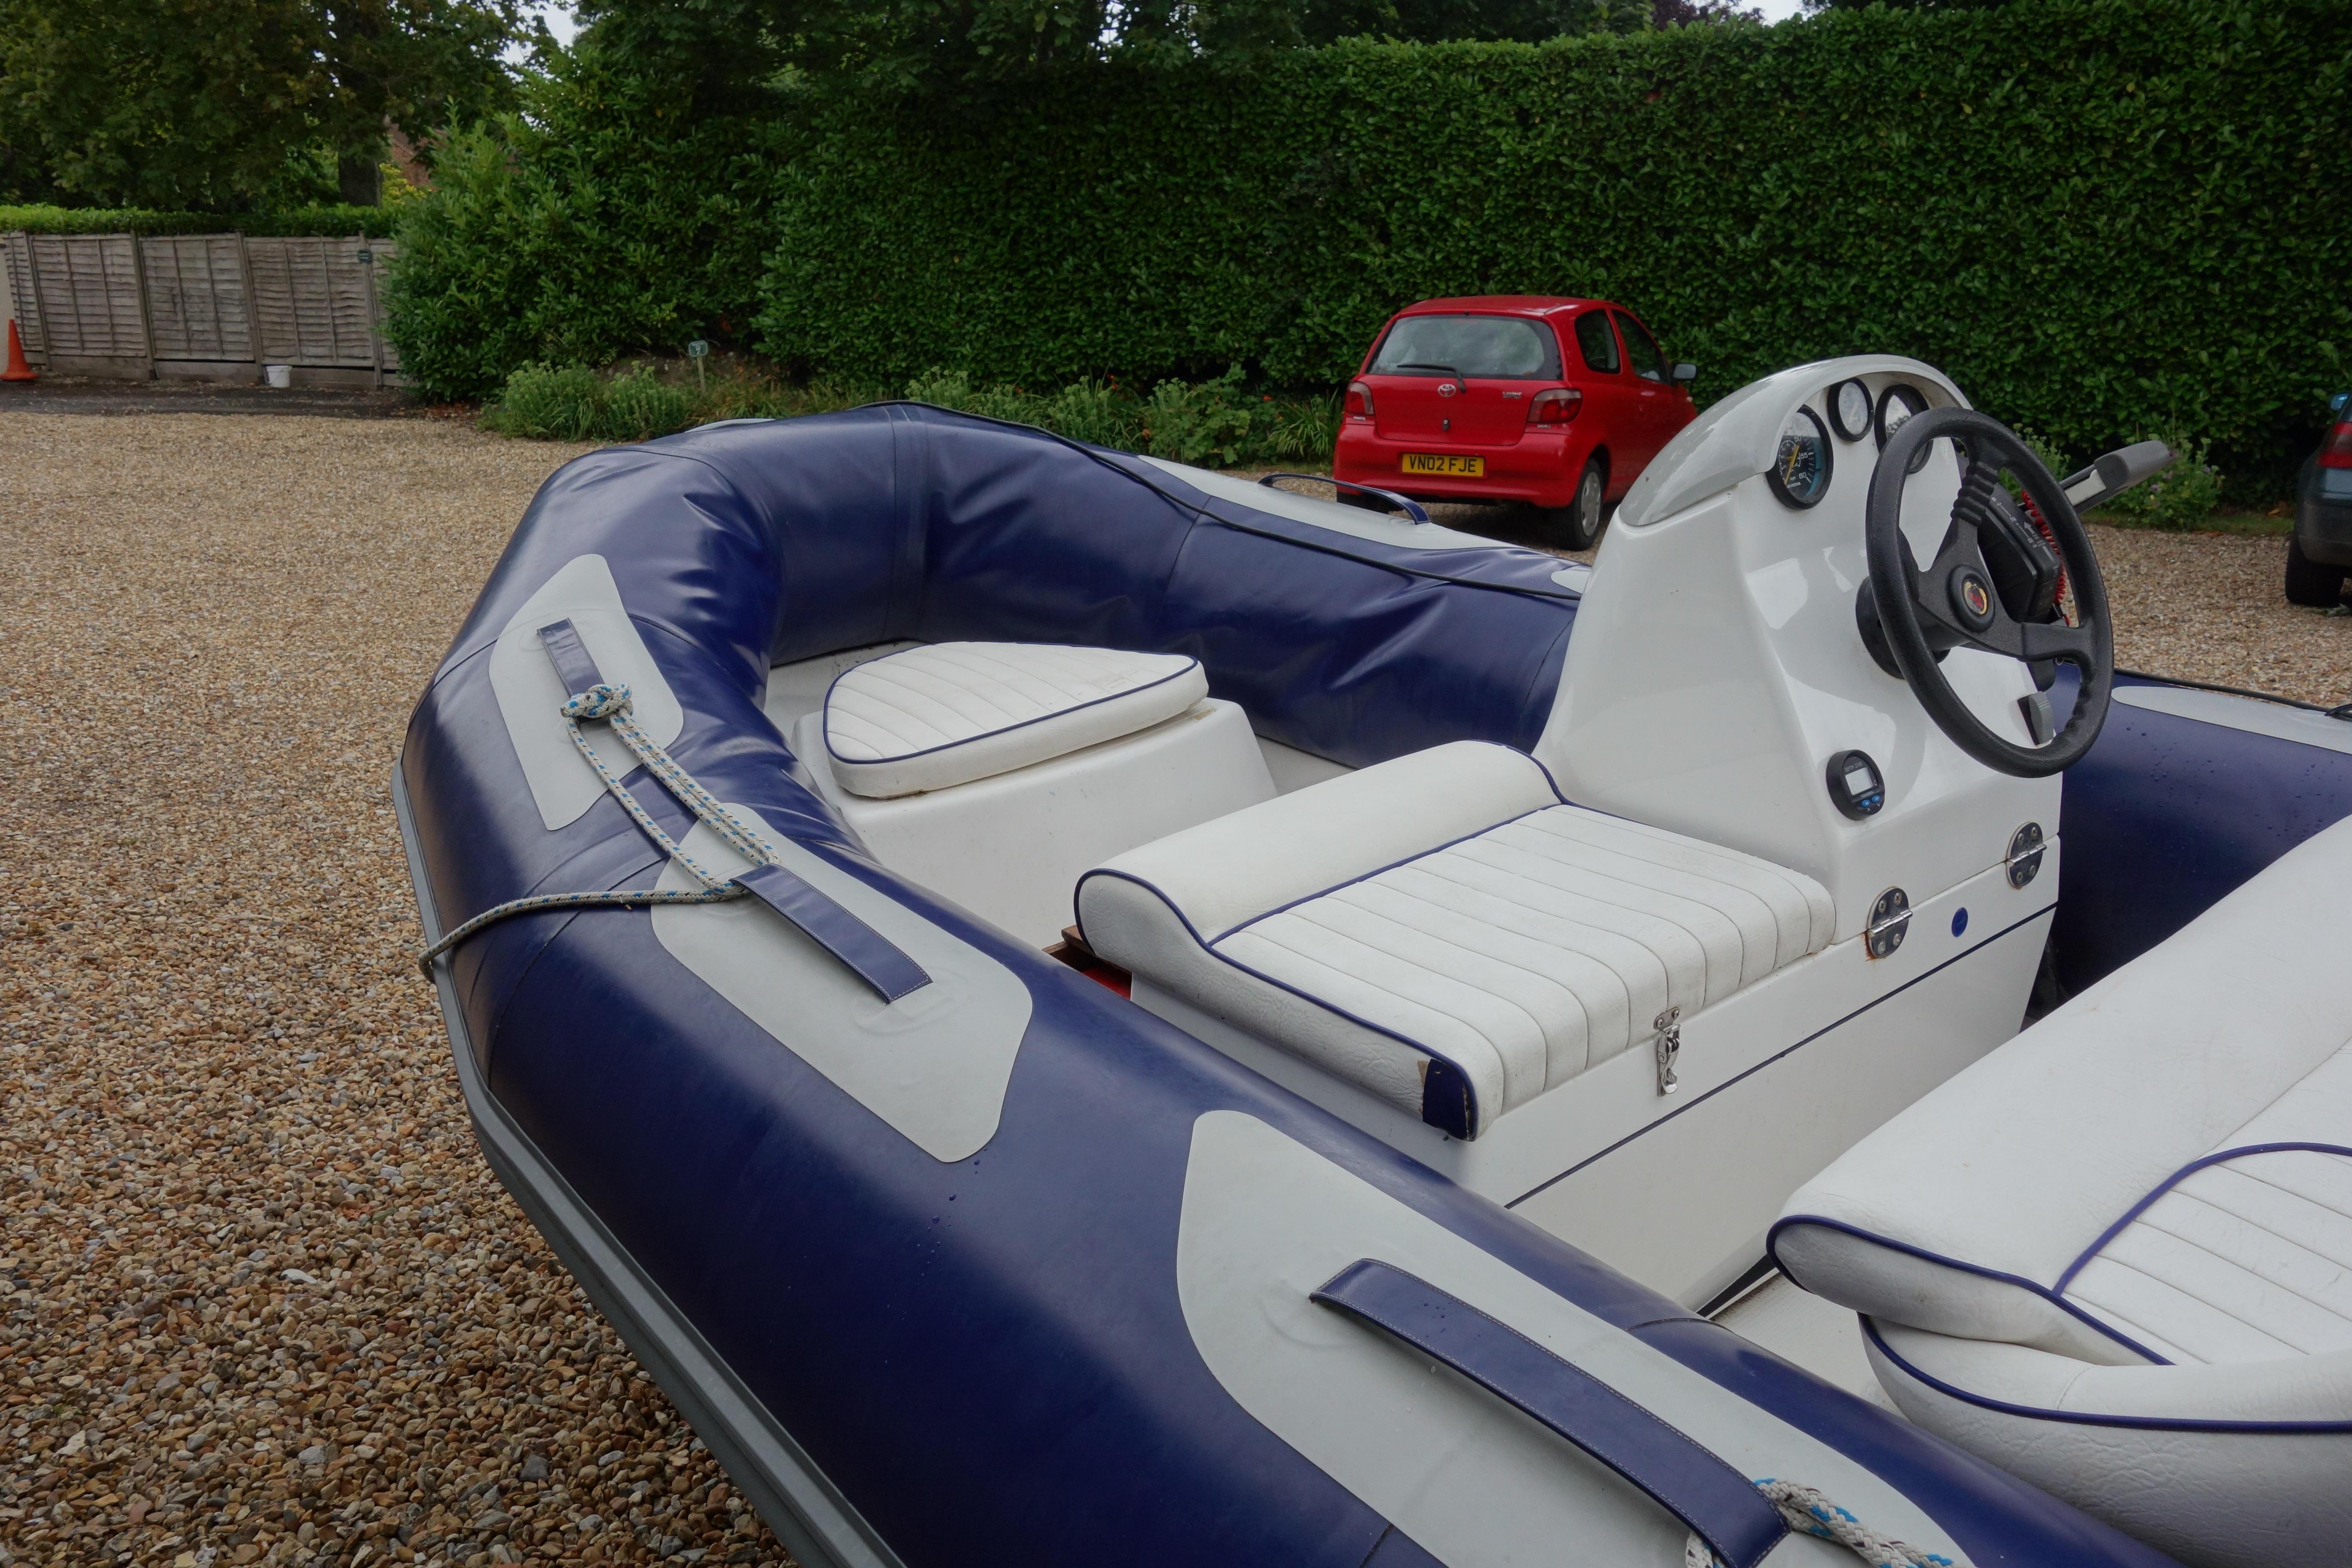 Boat - Avon RIB, Honda 50HP engine and trailer in Chichester